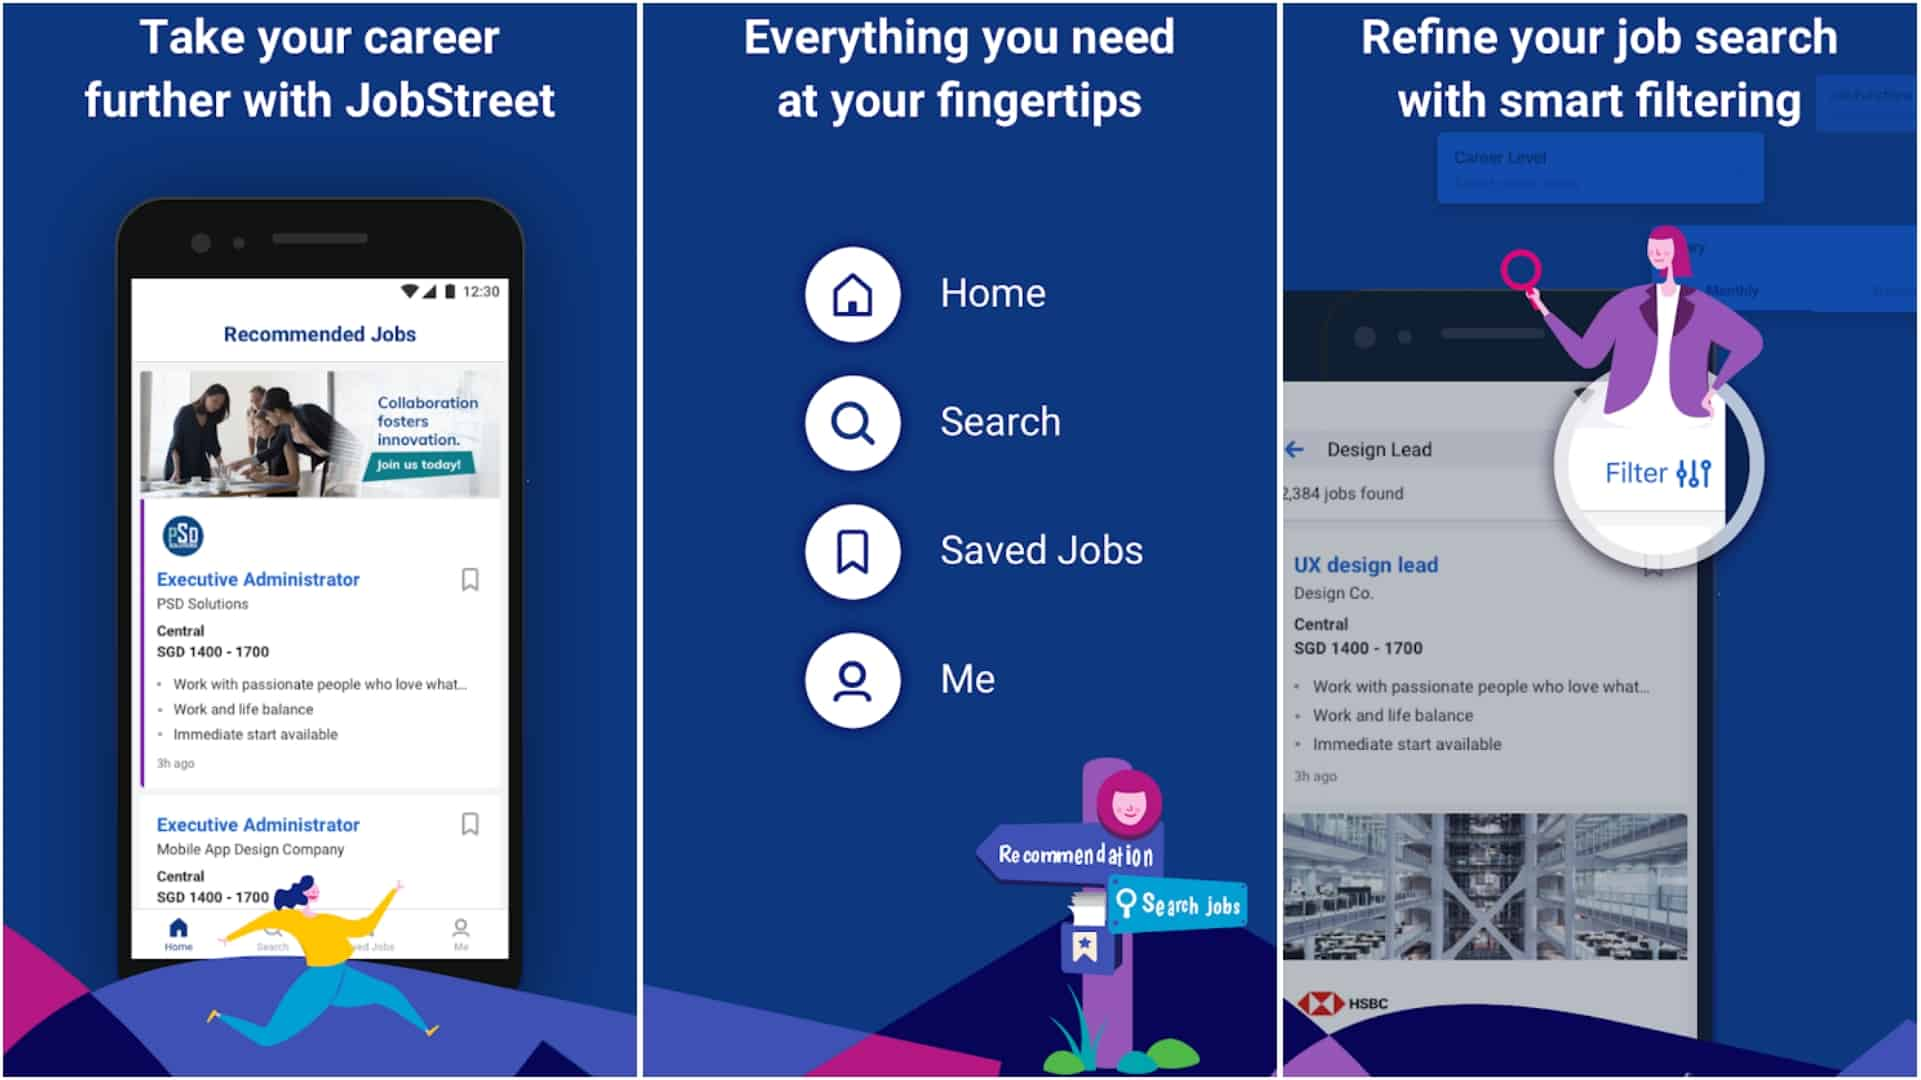 JobStreet app image June 2020